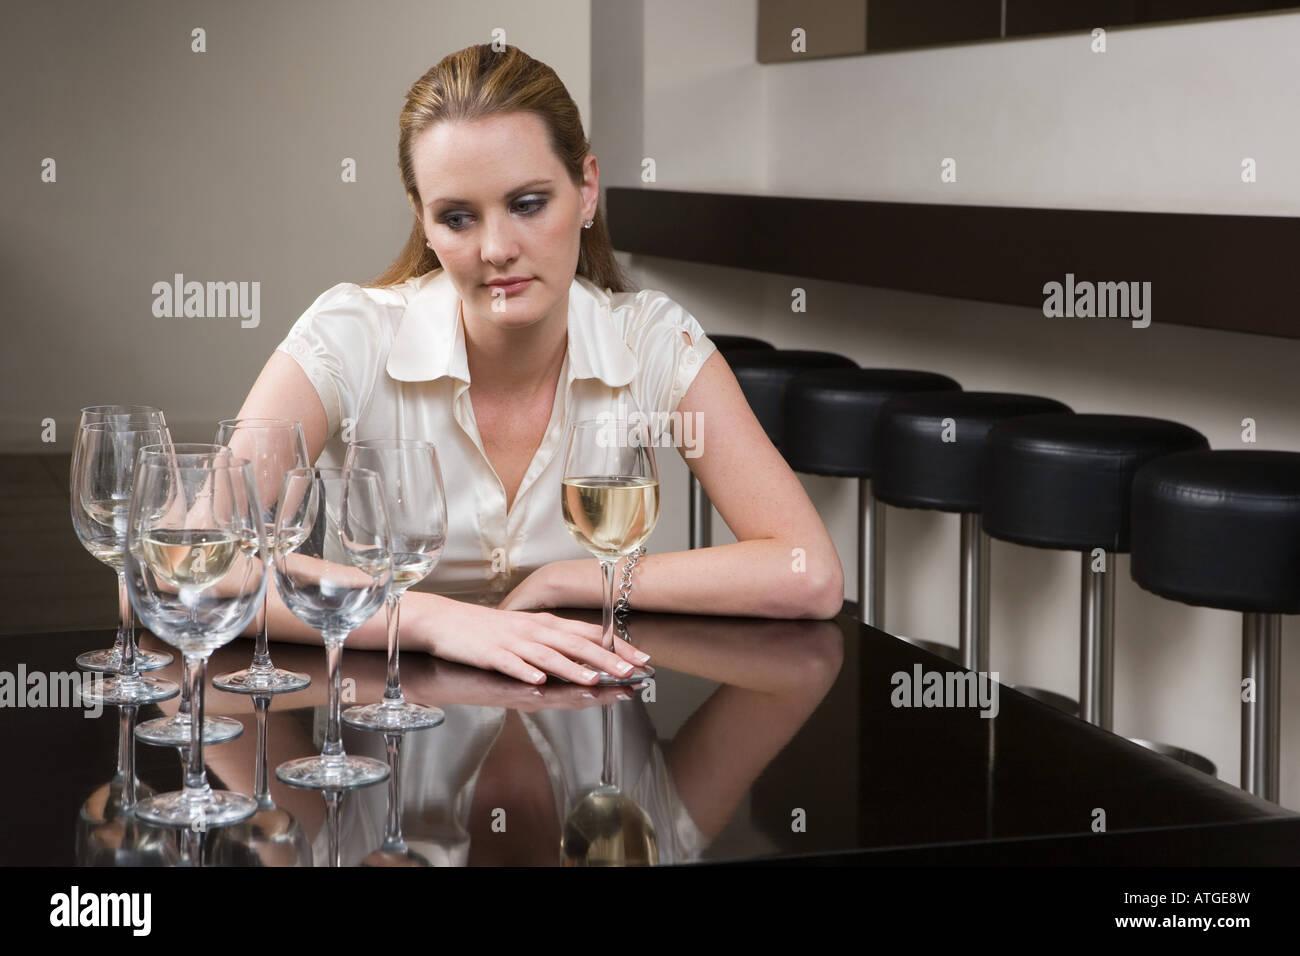 Drunken woman in a bar Stock Photo